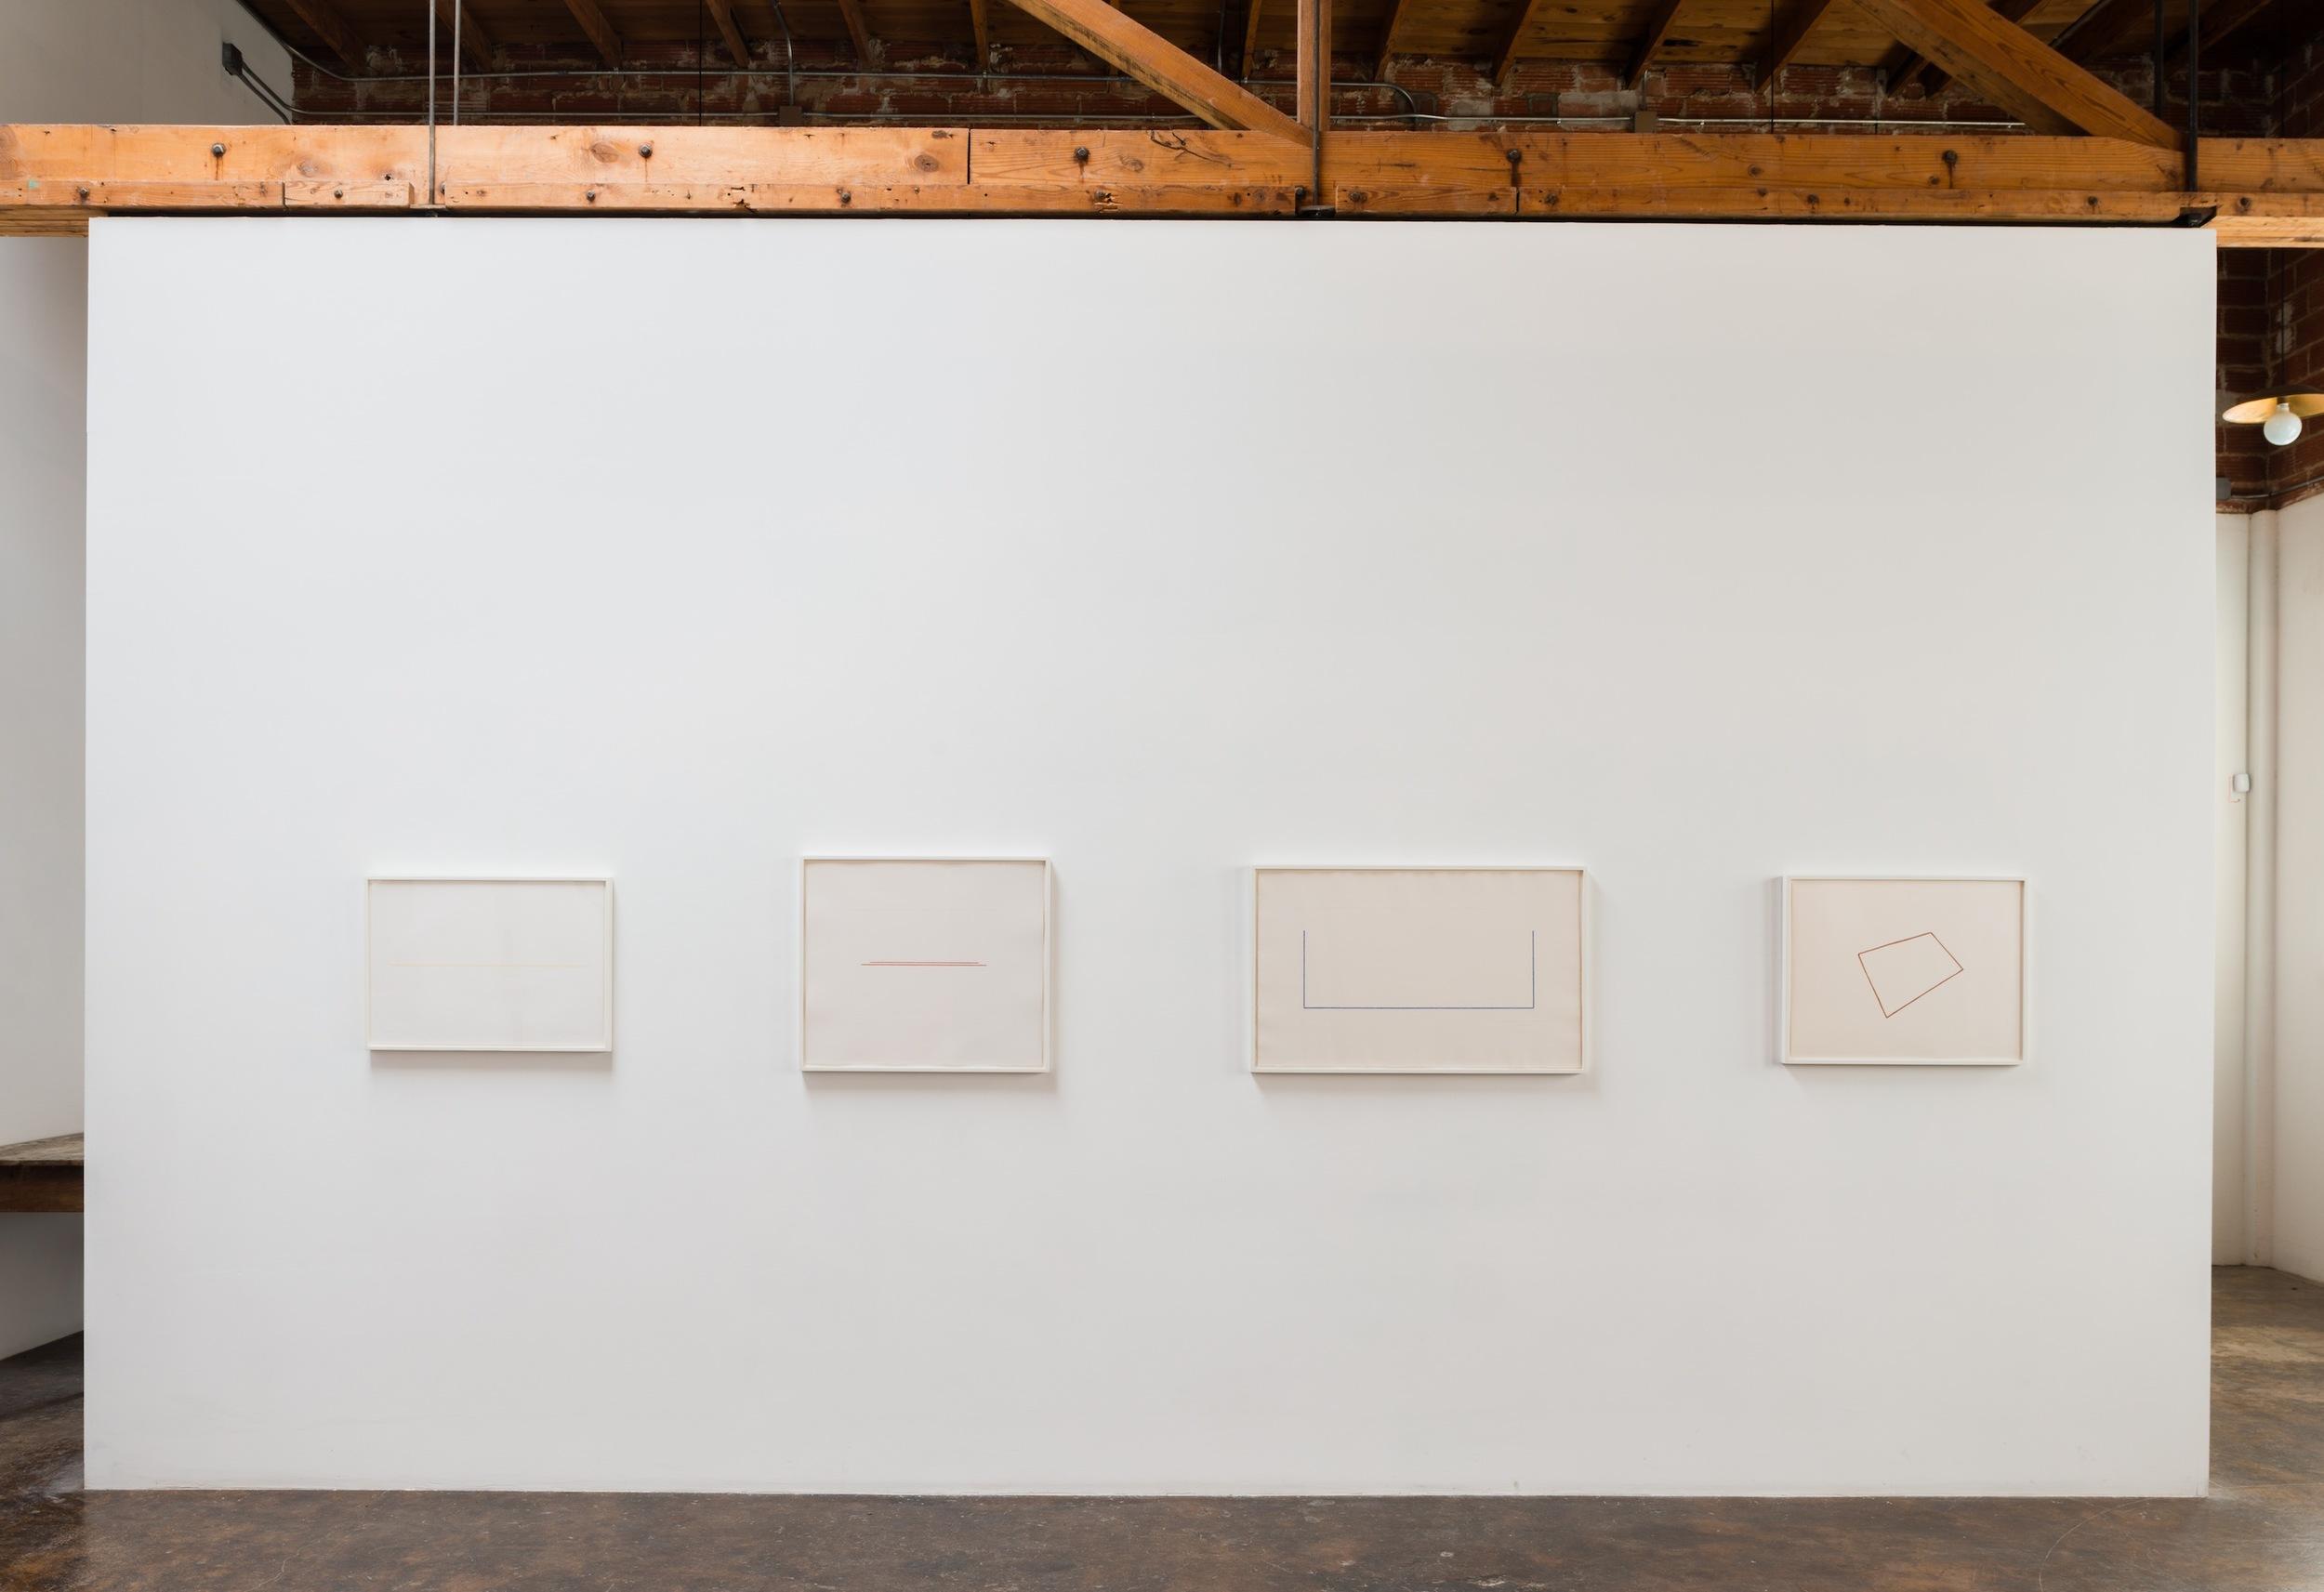 Fred Sandback Prints at Lawrence Markey 2015_3.jpeg